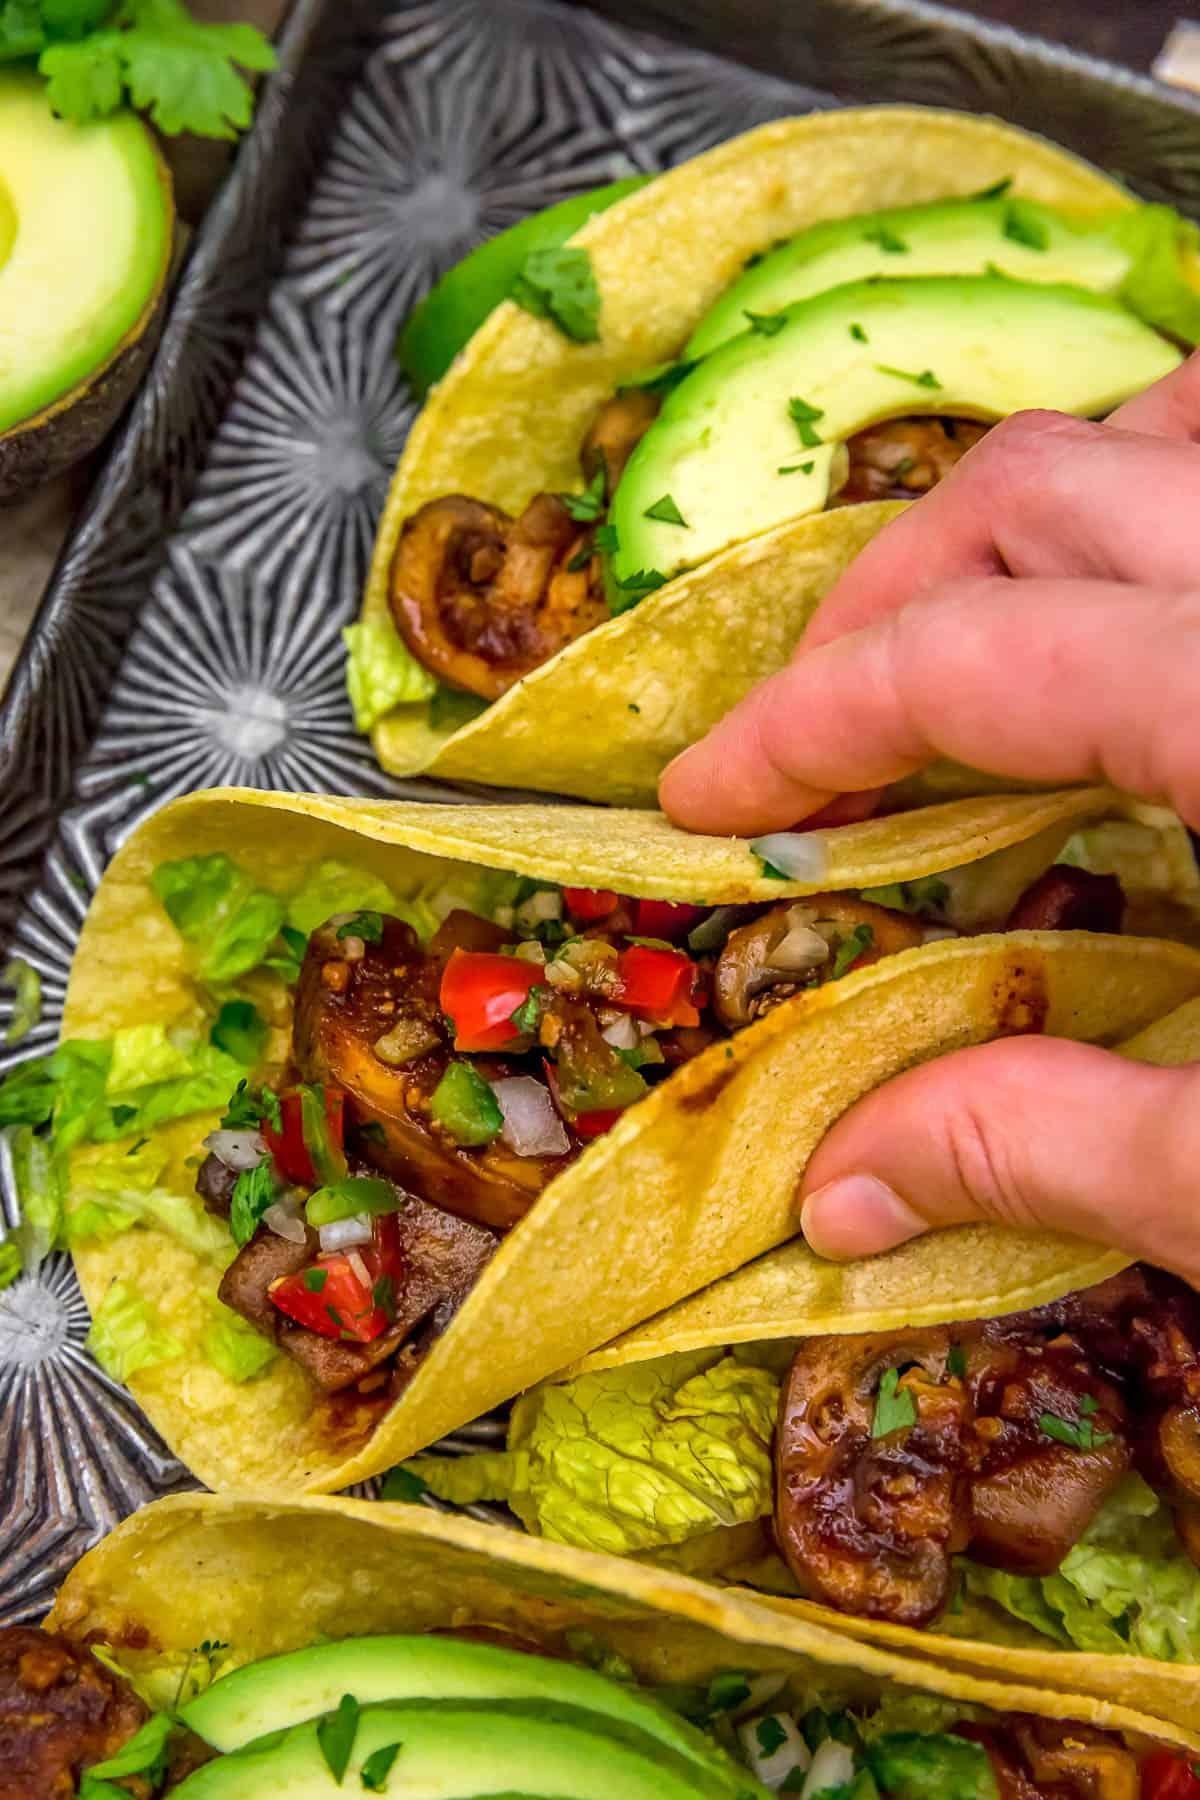 Eating Chipotle Mushroom Tacos